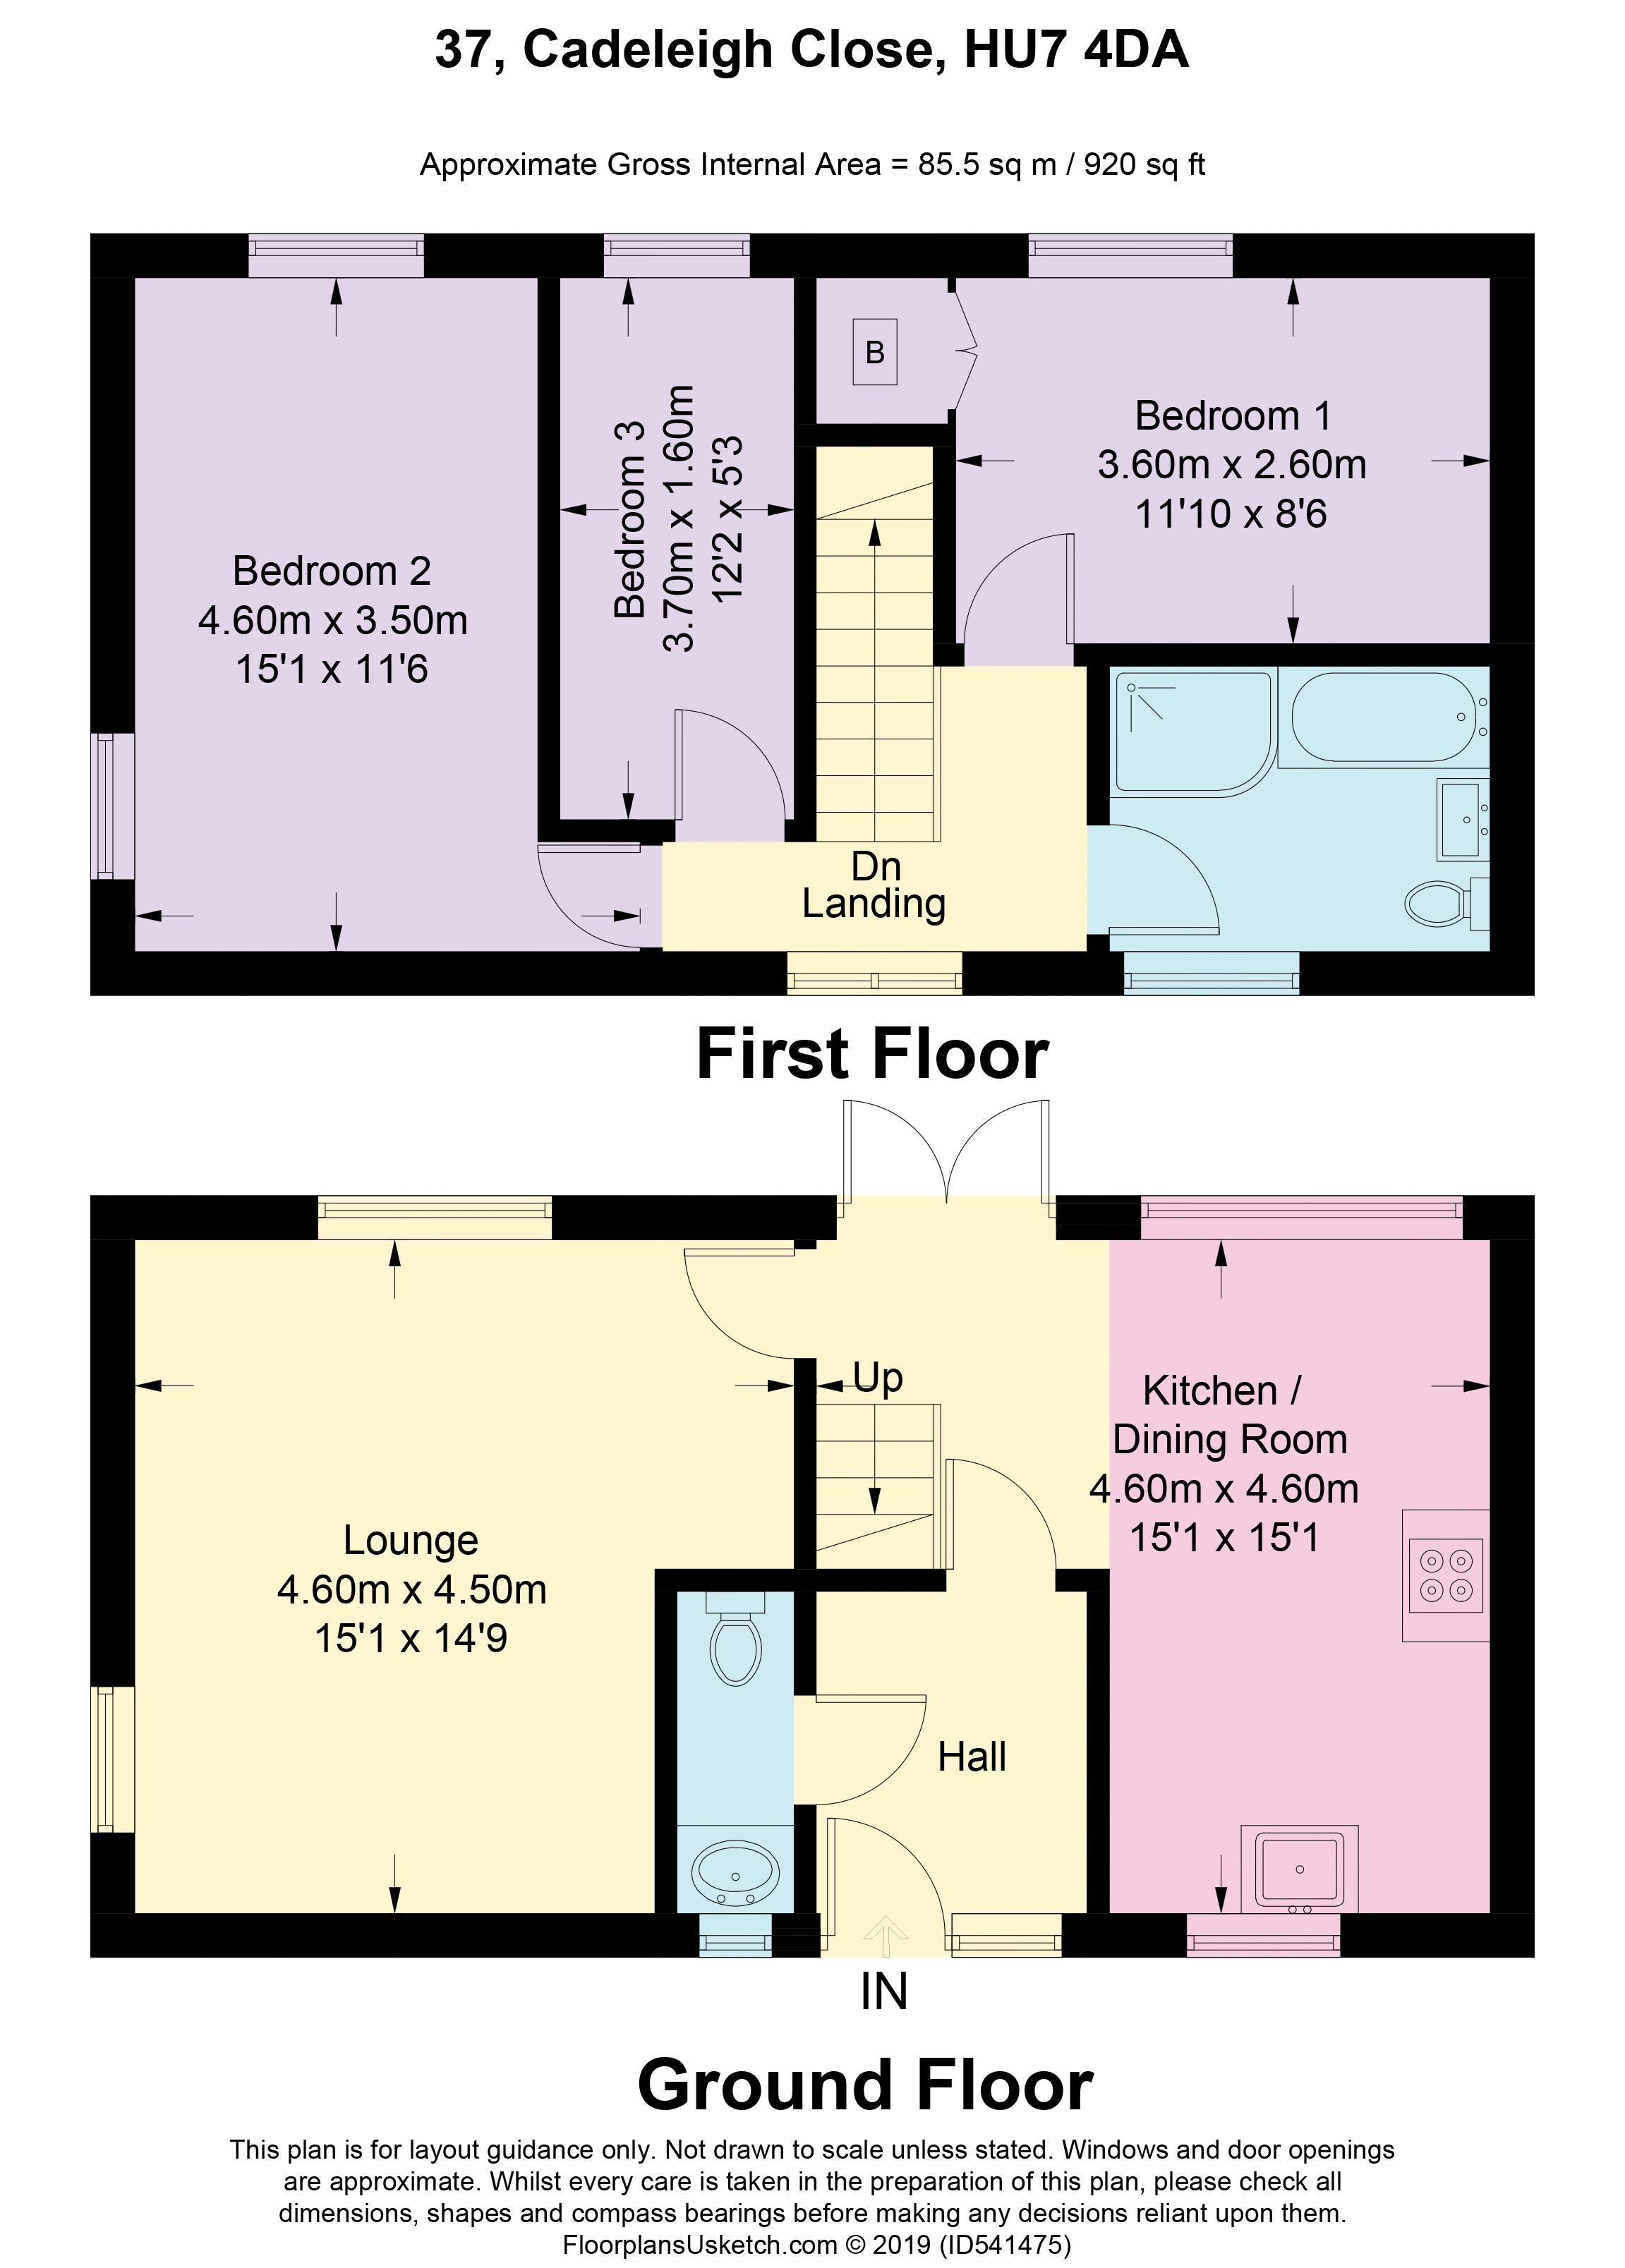 37 Cadeleigh Close - Floorplan